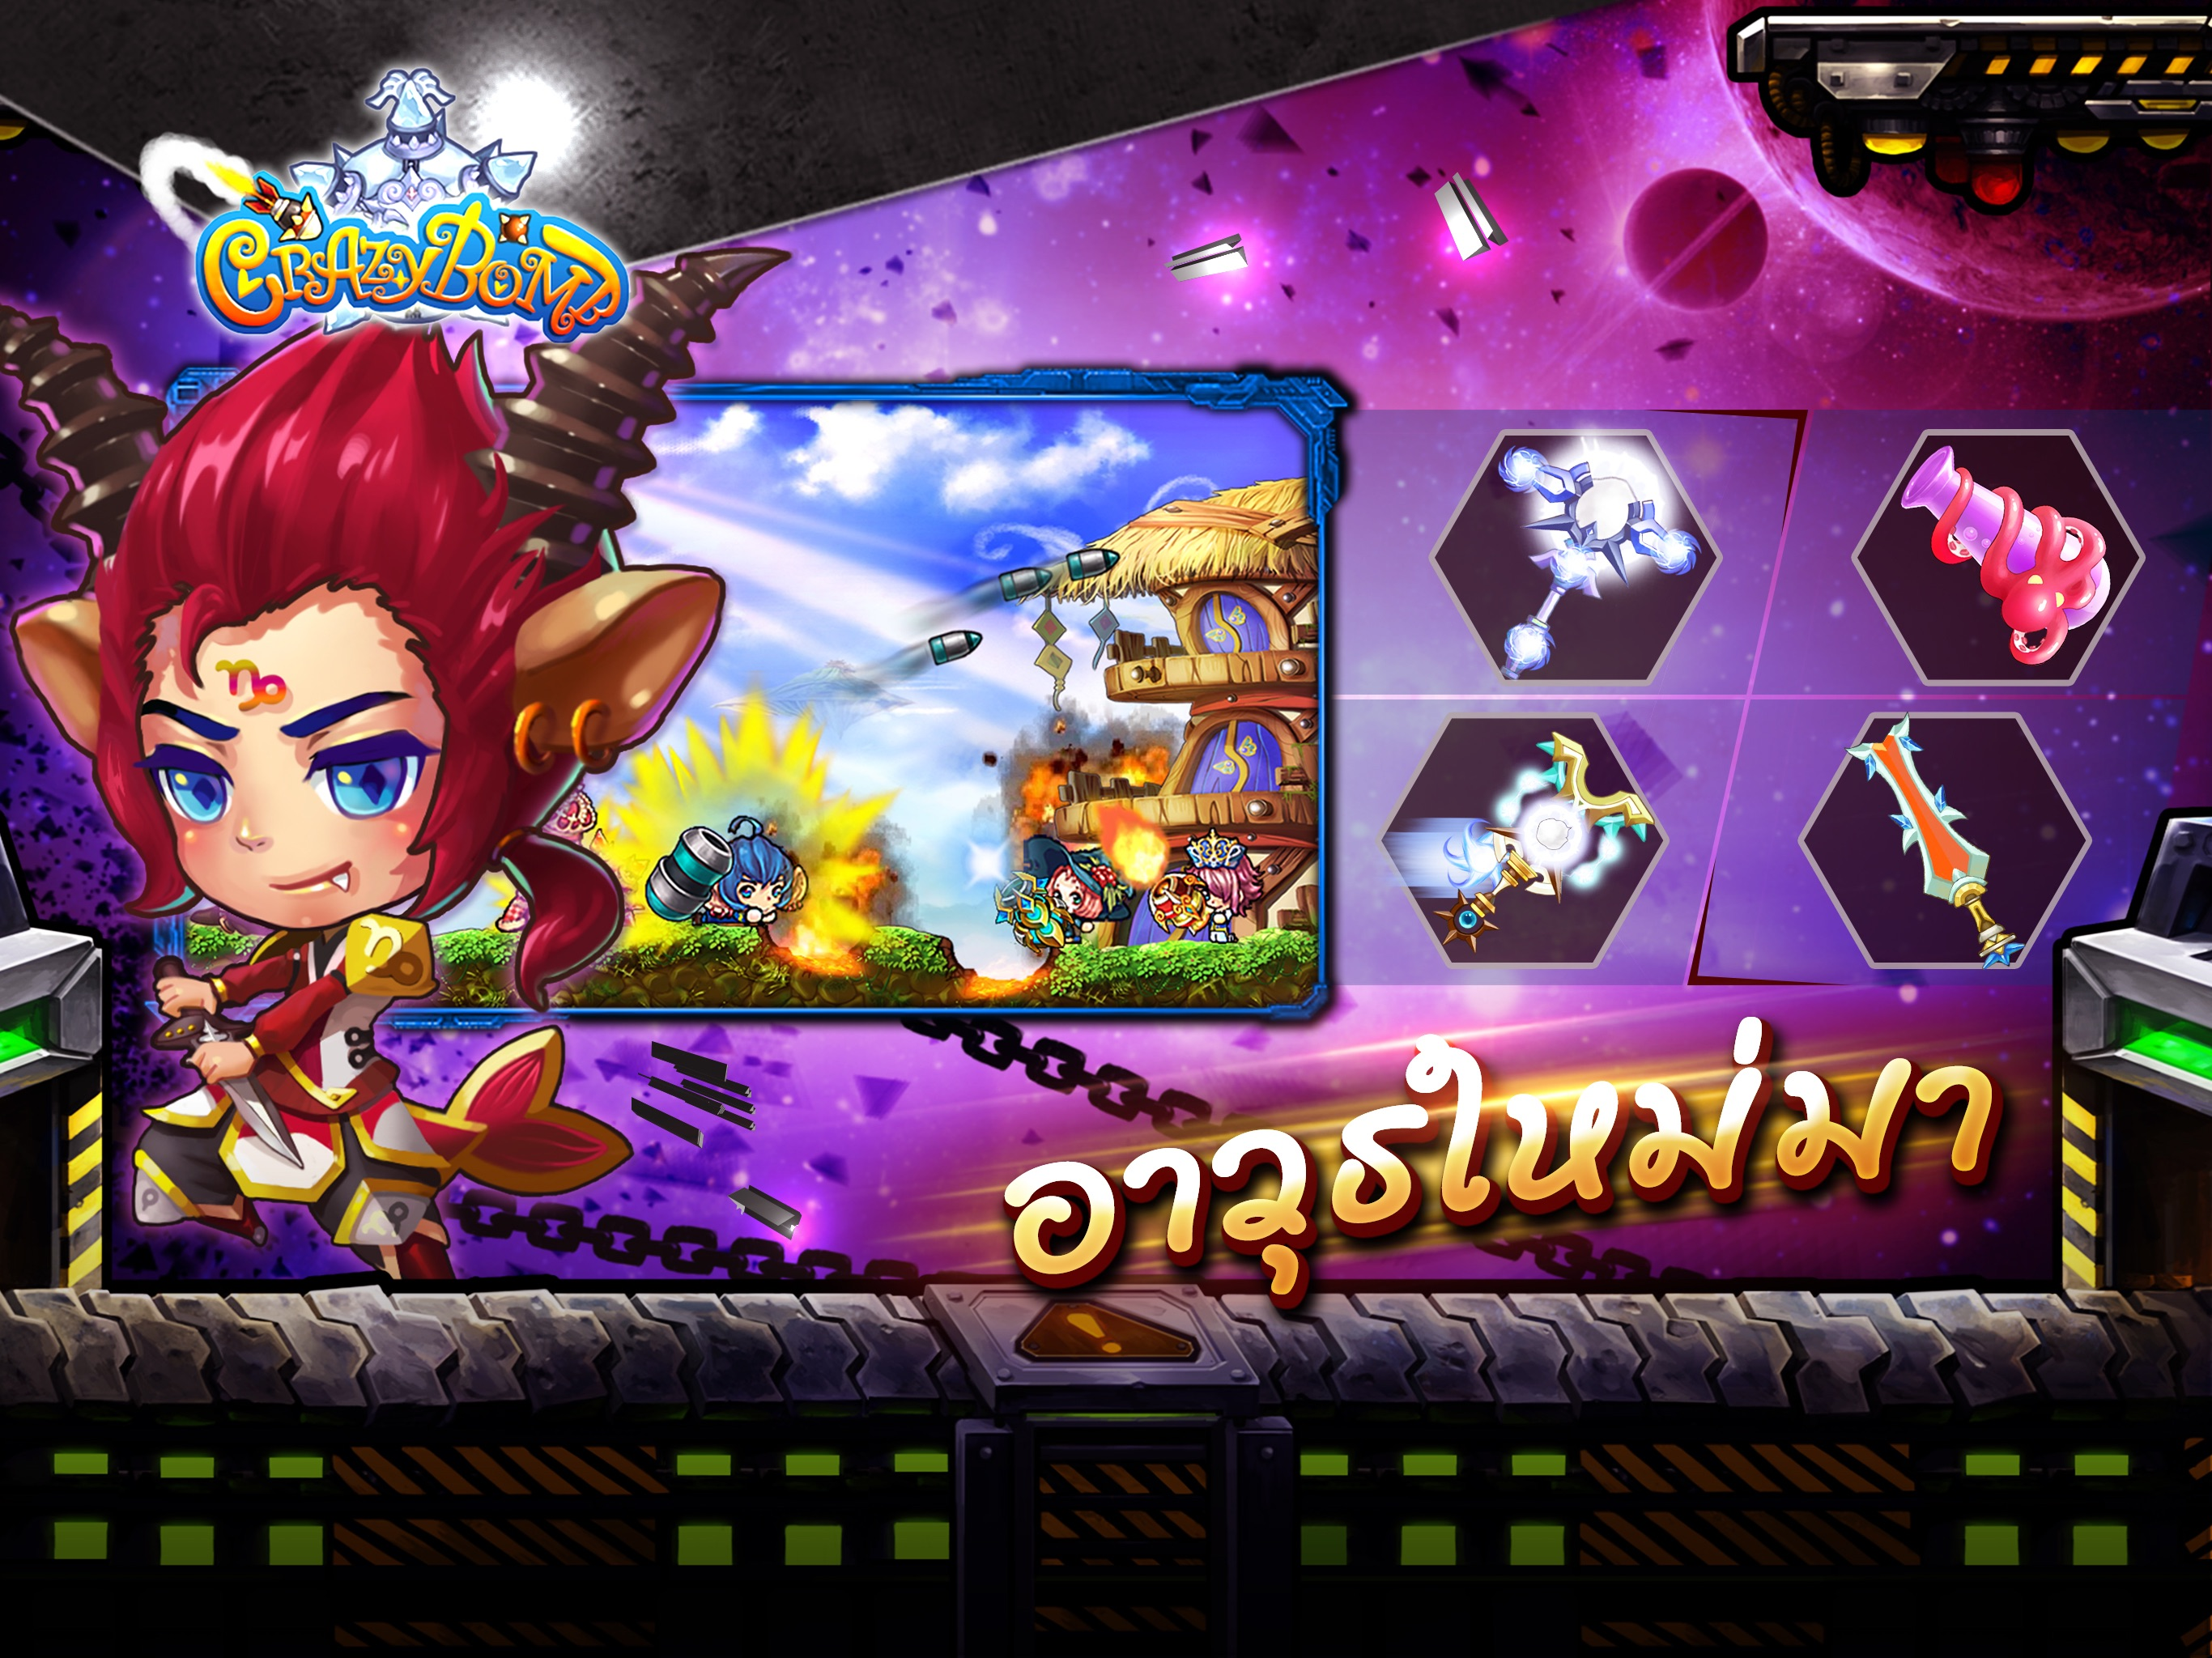 CrazyBomb HD Screenshot